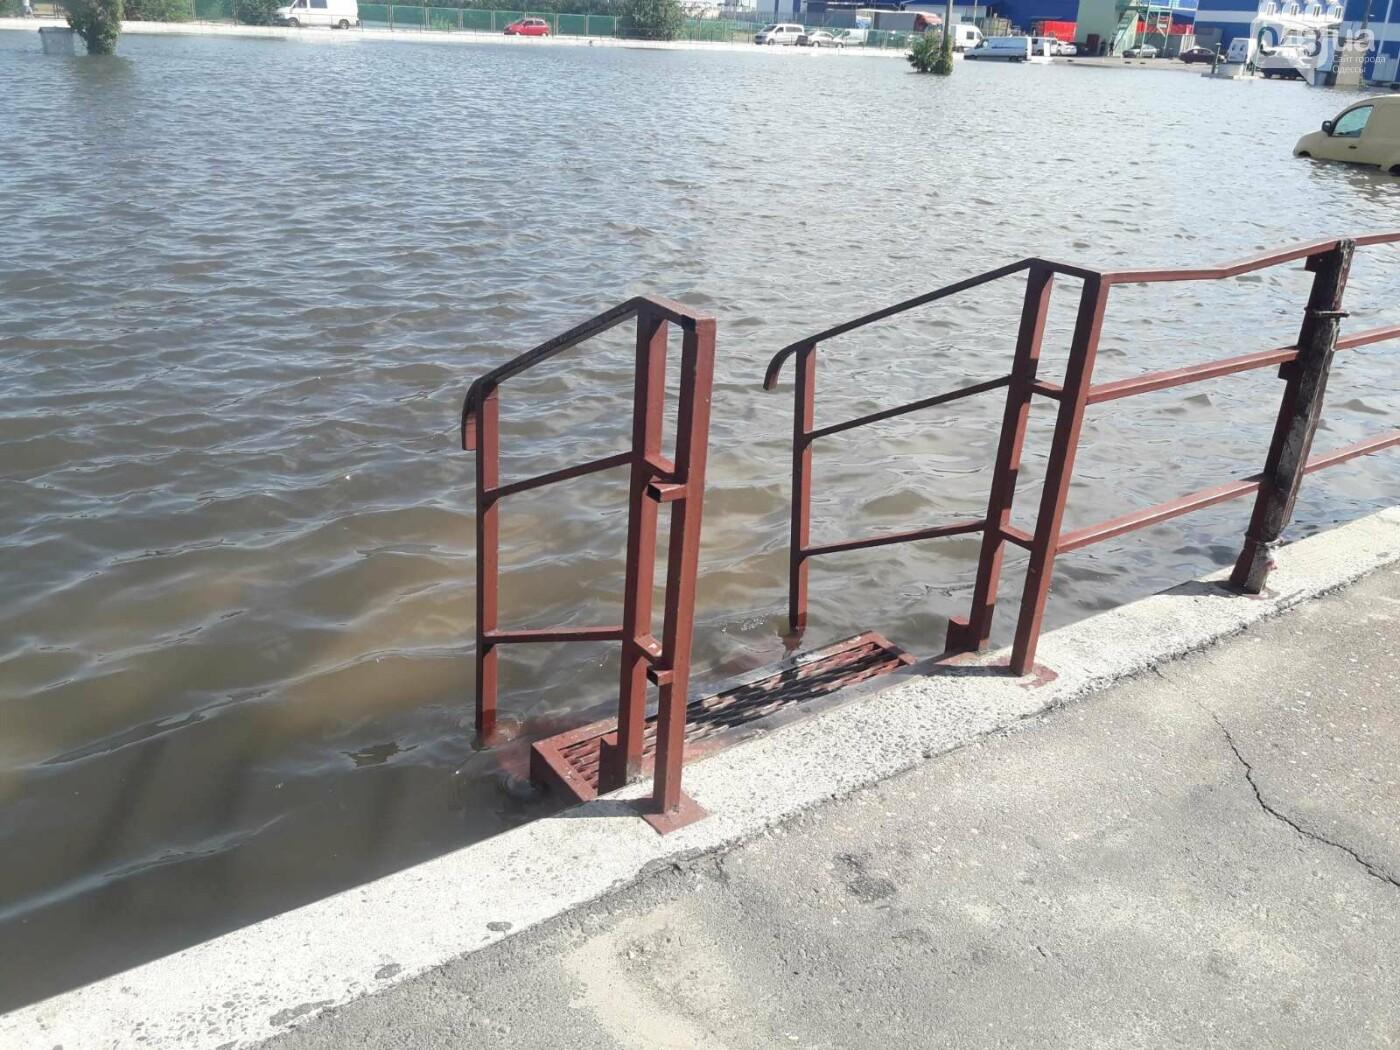 На промрынке 7км в Одессе образовалось море, - ФОТО, фото-13